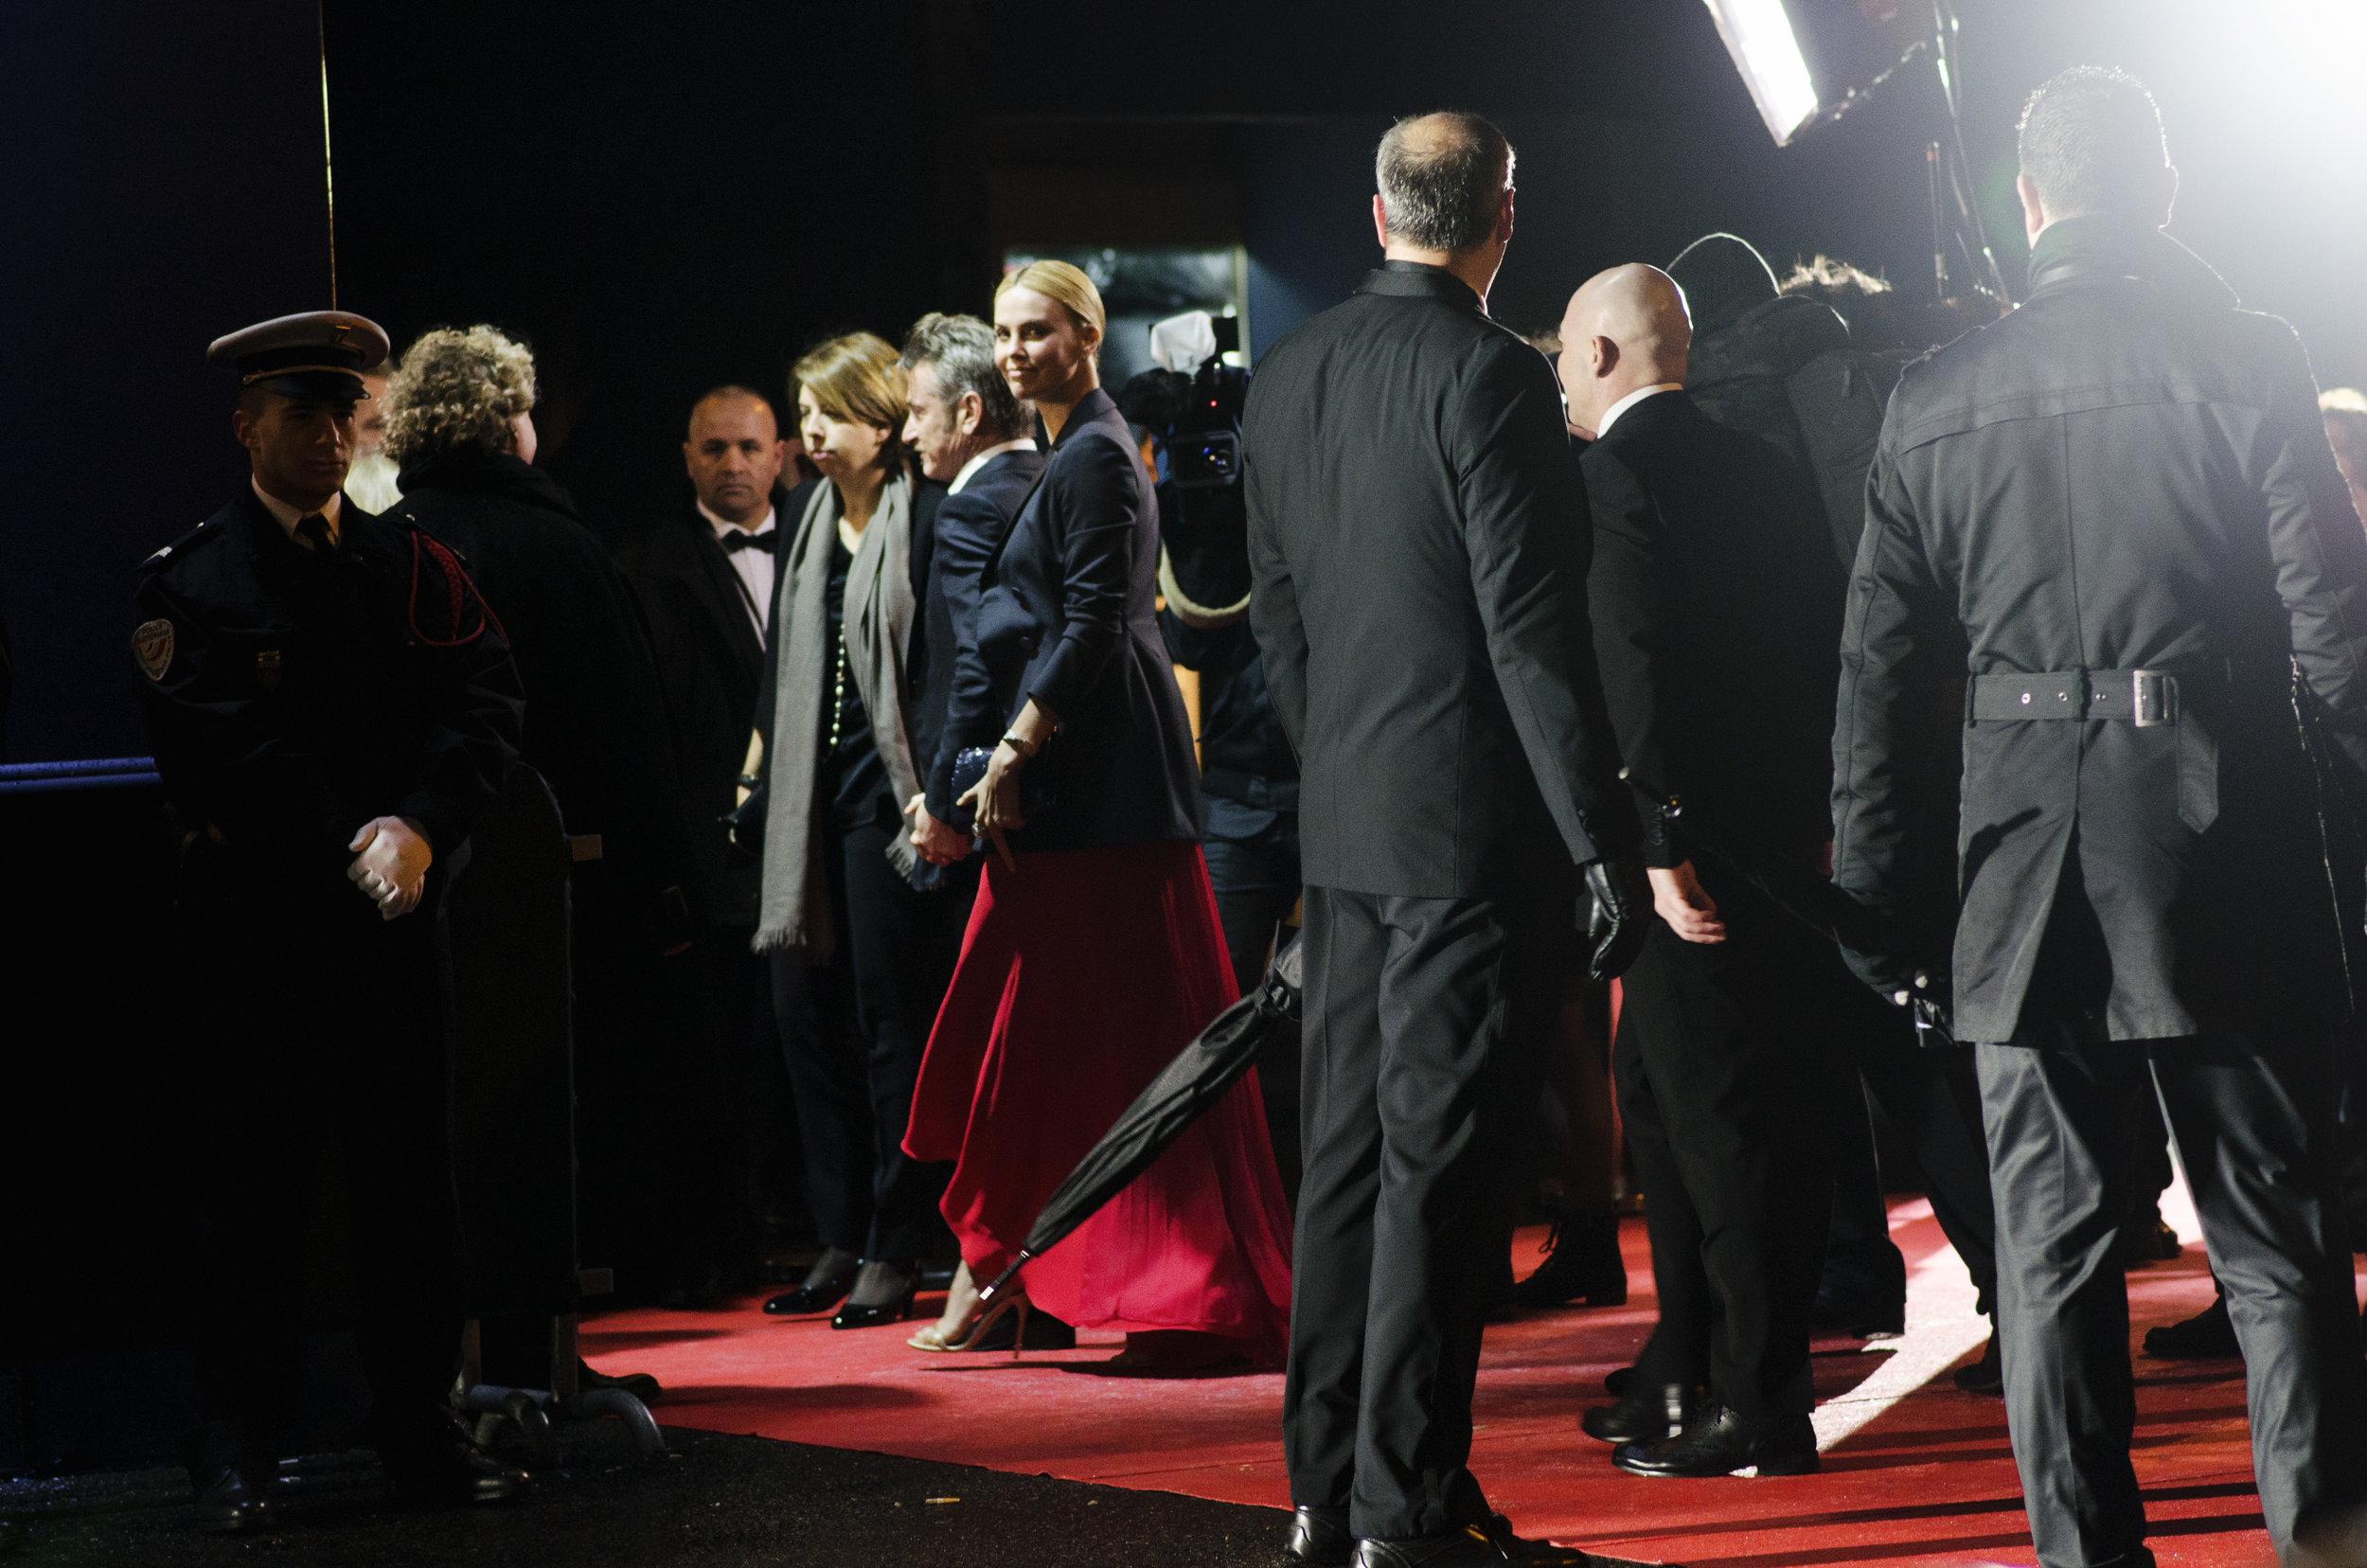 Sean Penn & Charlize Theron